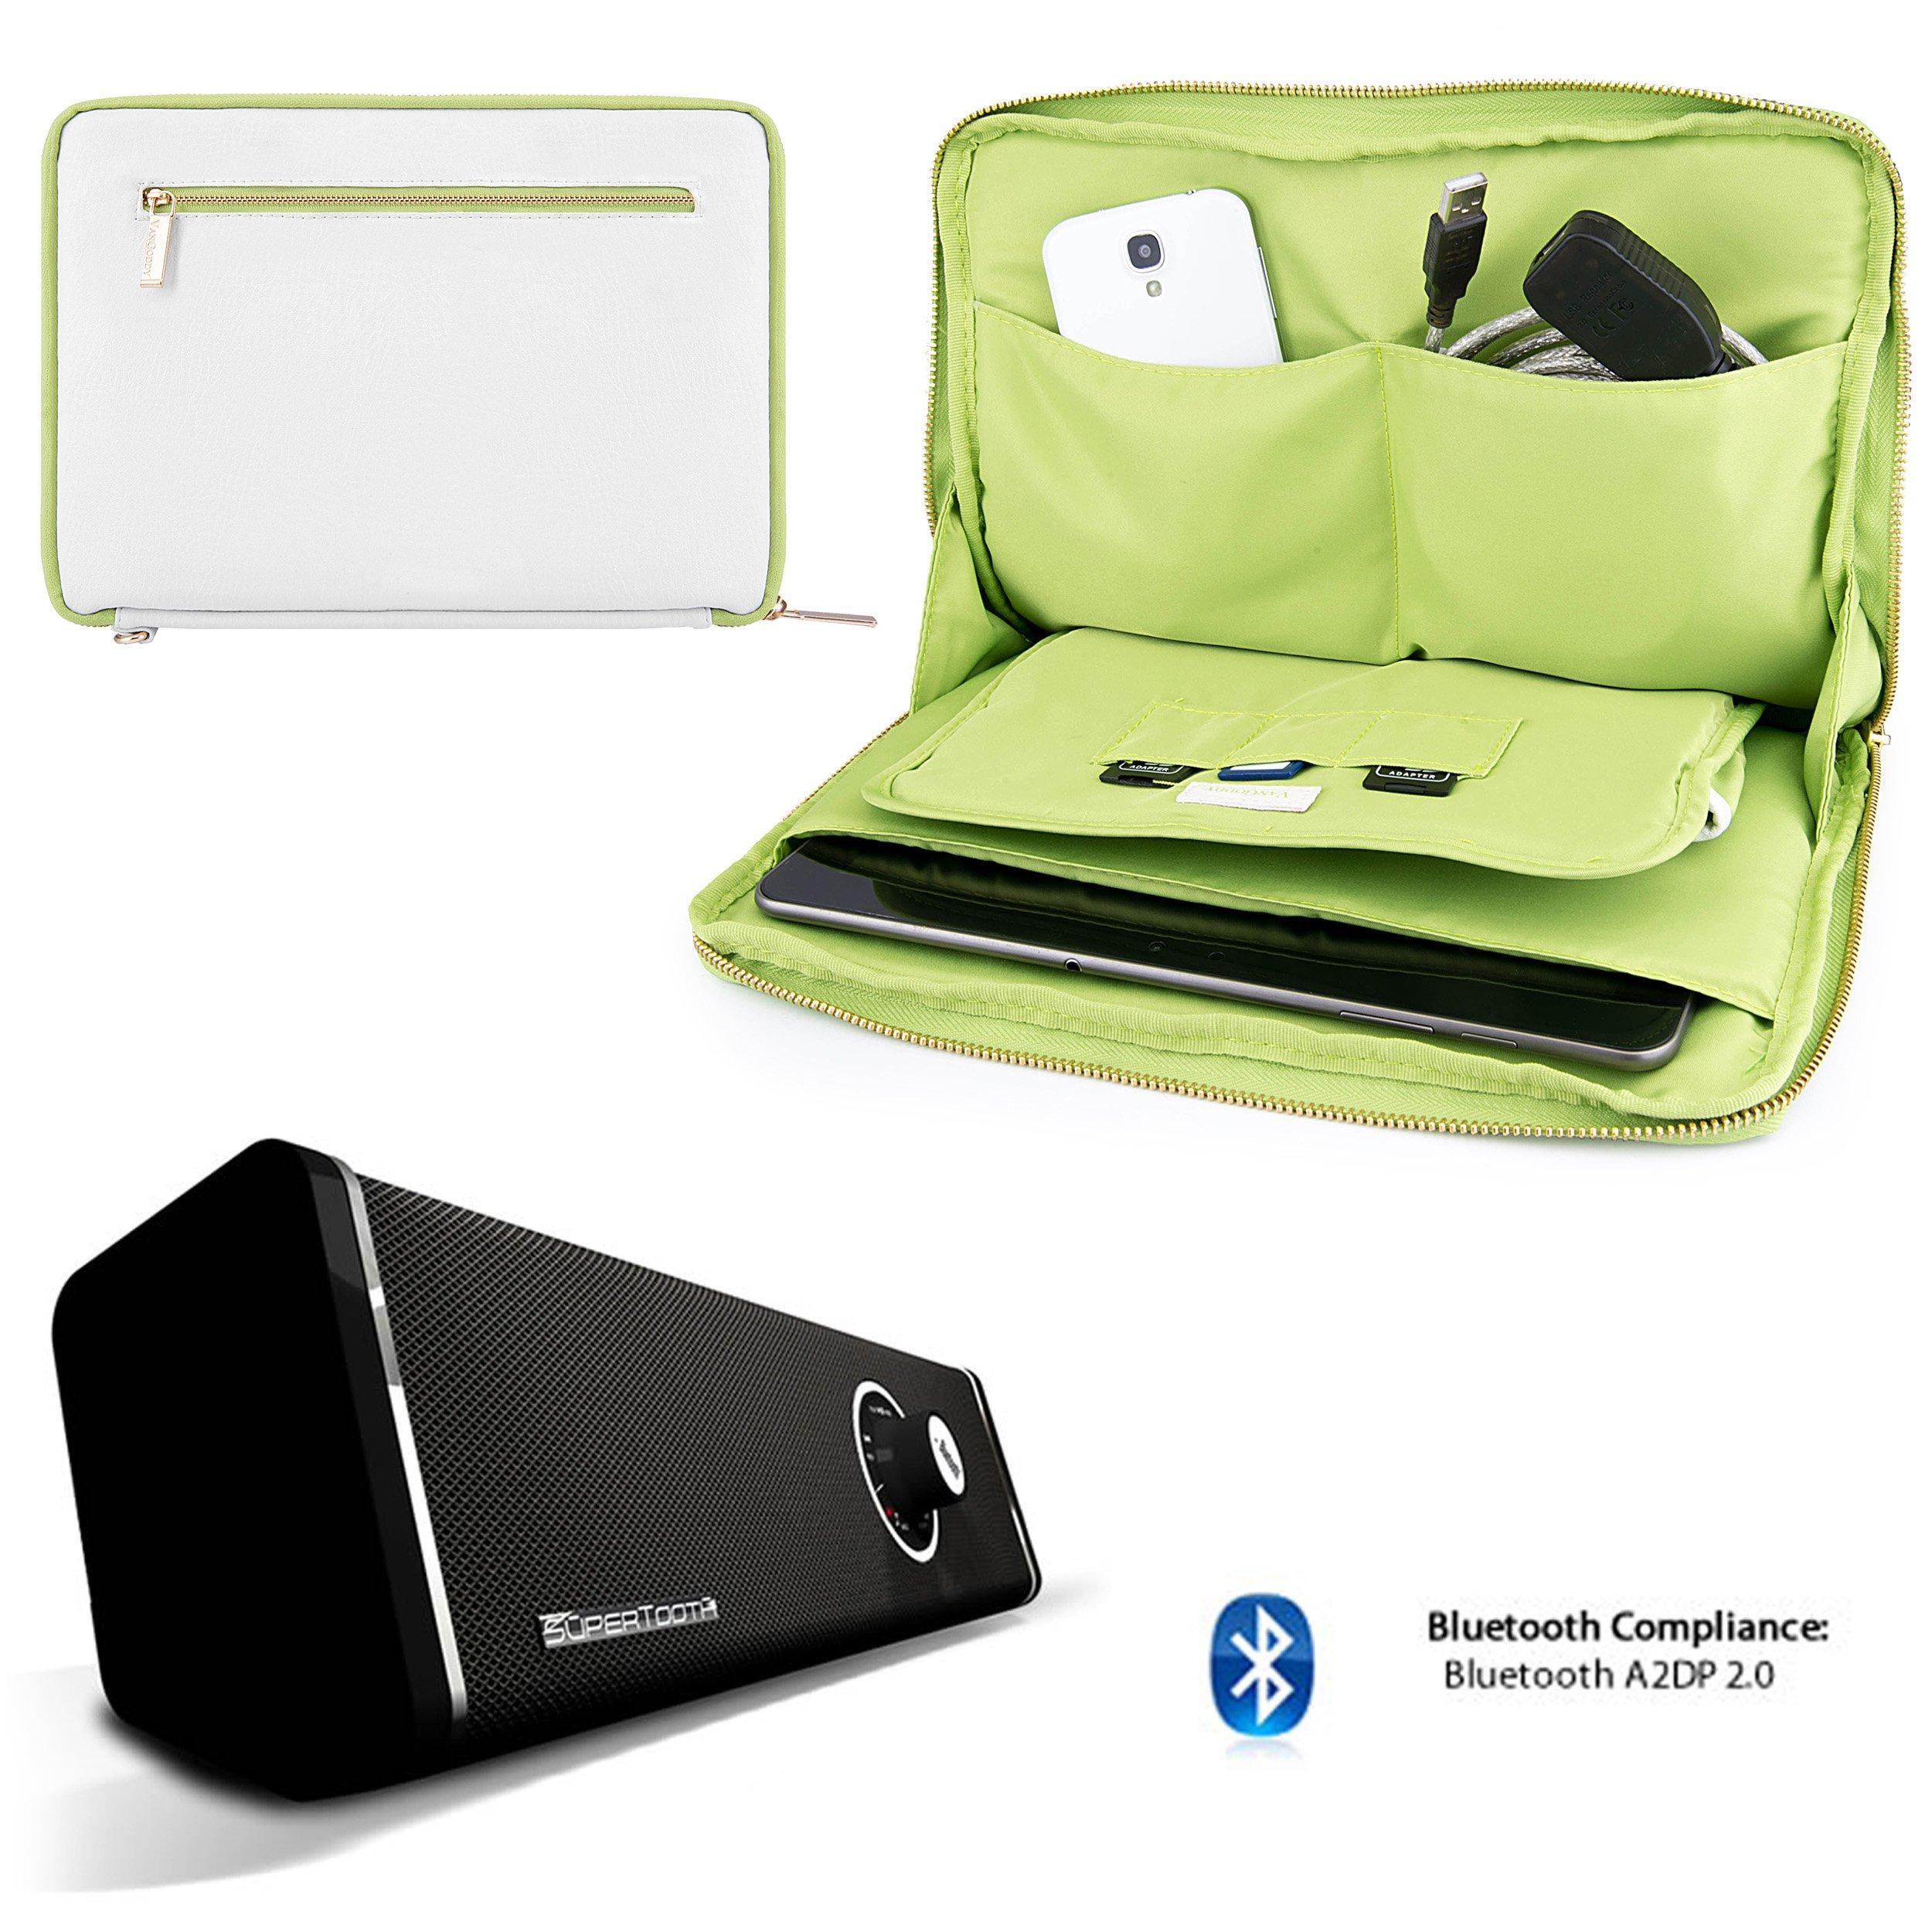 Travel Leatherette Sleeve For Samsung Galaxy Tab S 10.5 / Galaxy Tab 4 10.1 / Galaxy Tab Pro 10.1 + Bluetooth Speaker